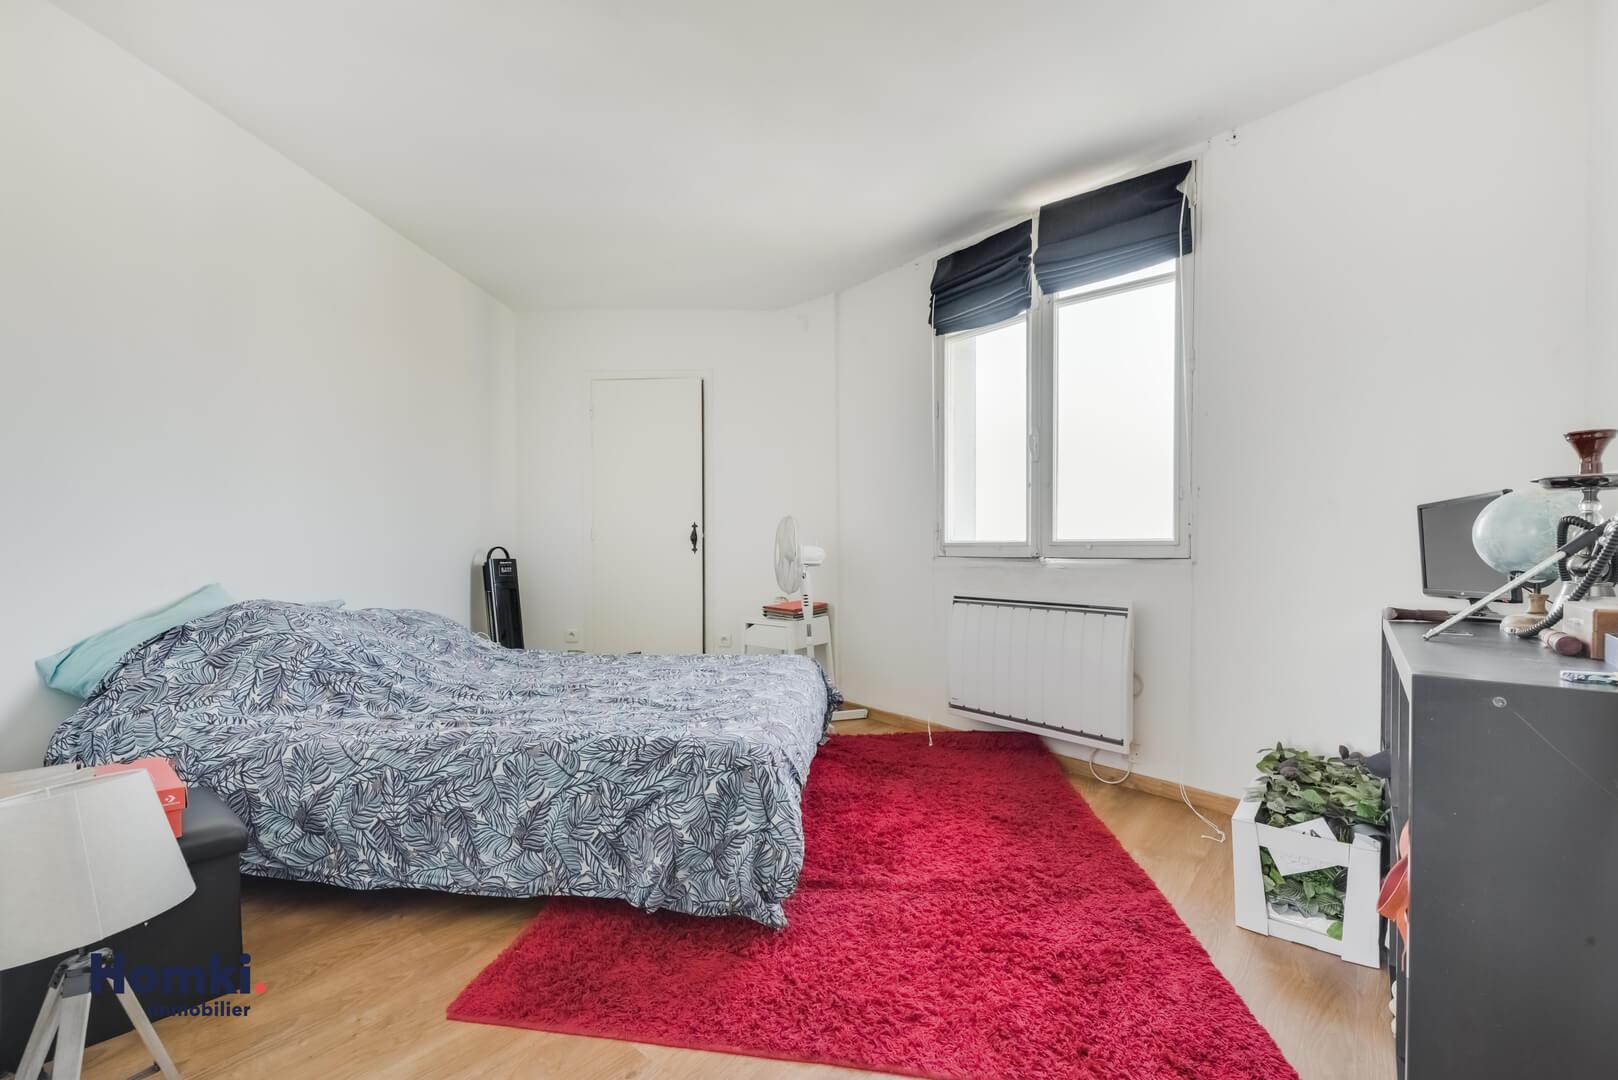 Vente appartement Marseille T3 13006 Castellane Prado_7